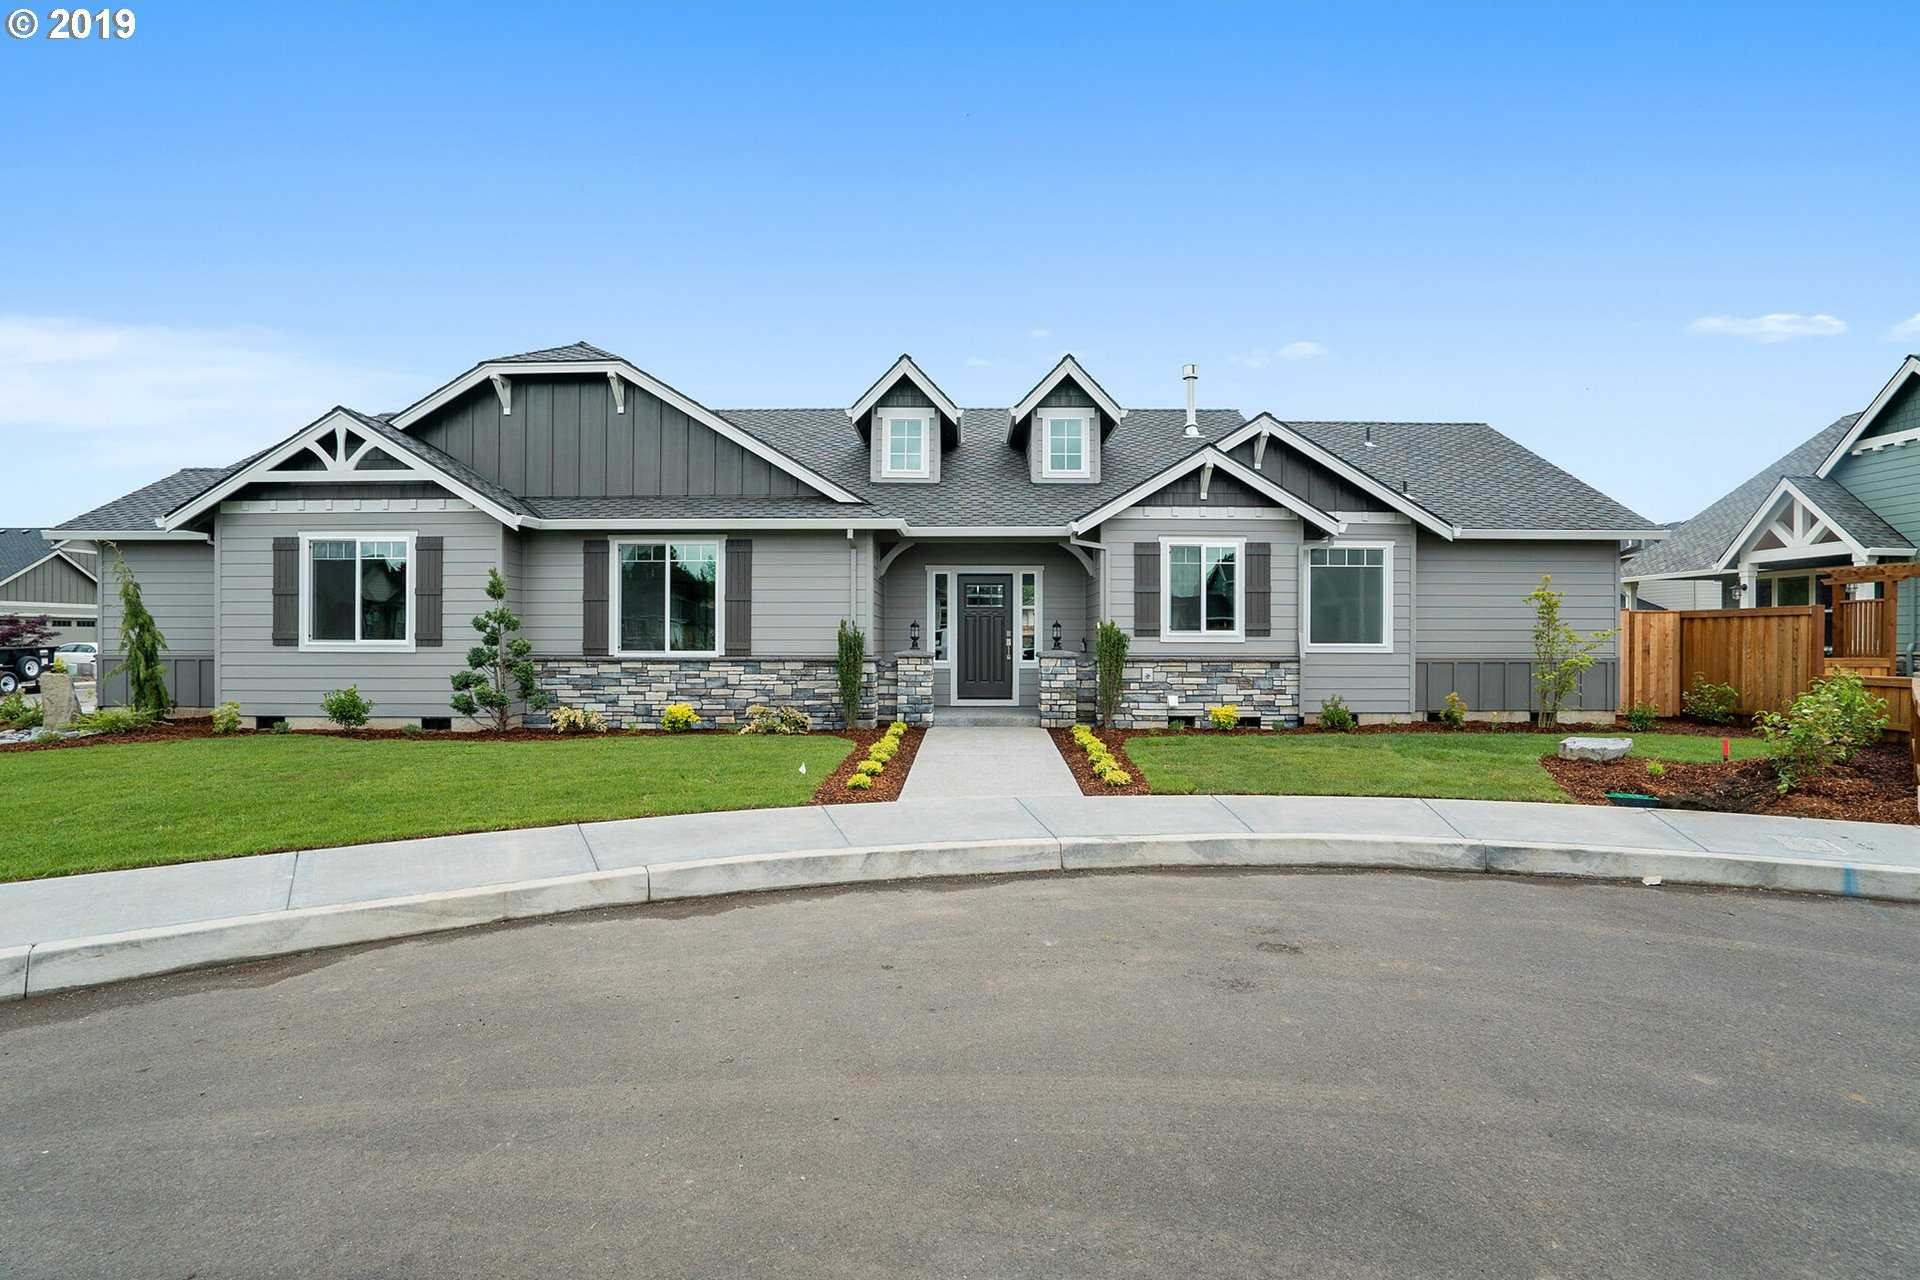 $549,900 - 4Br/2Ba -  for Sale in Northwood Estates, Canby